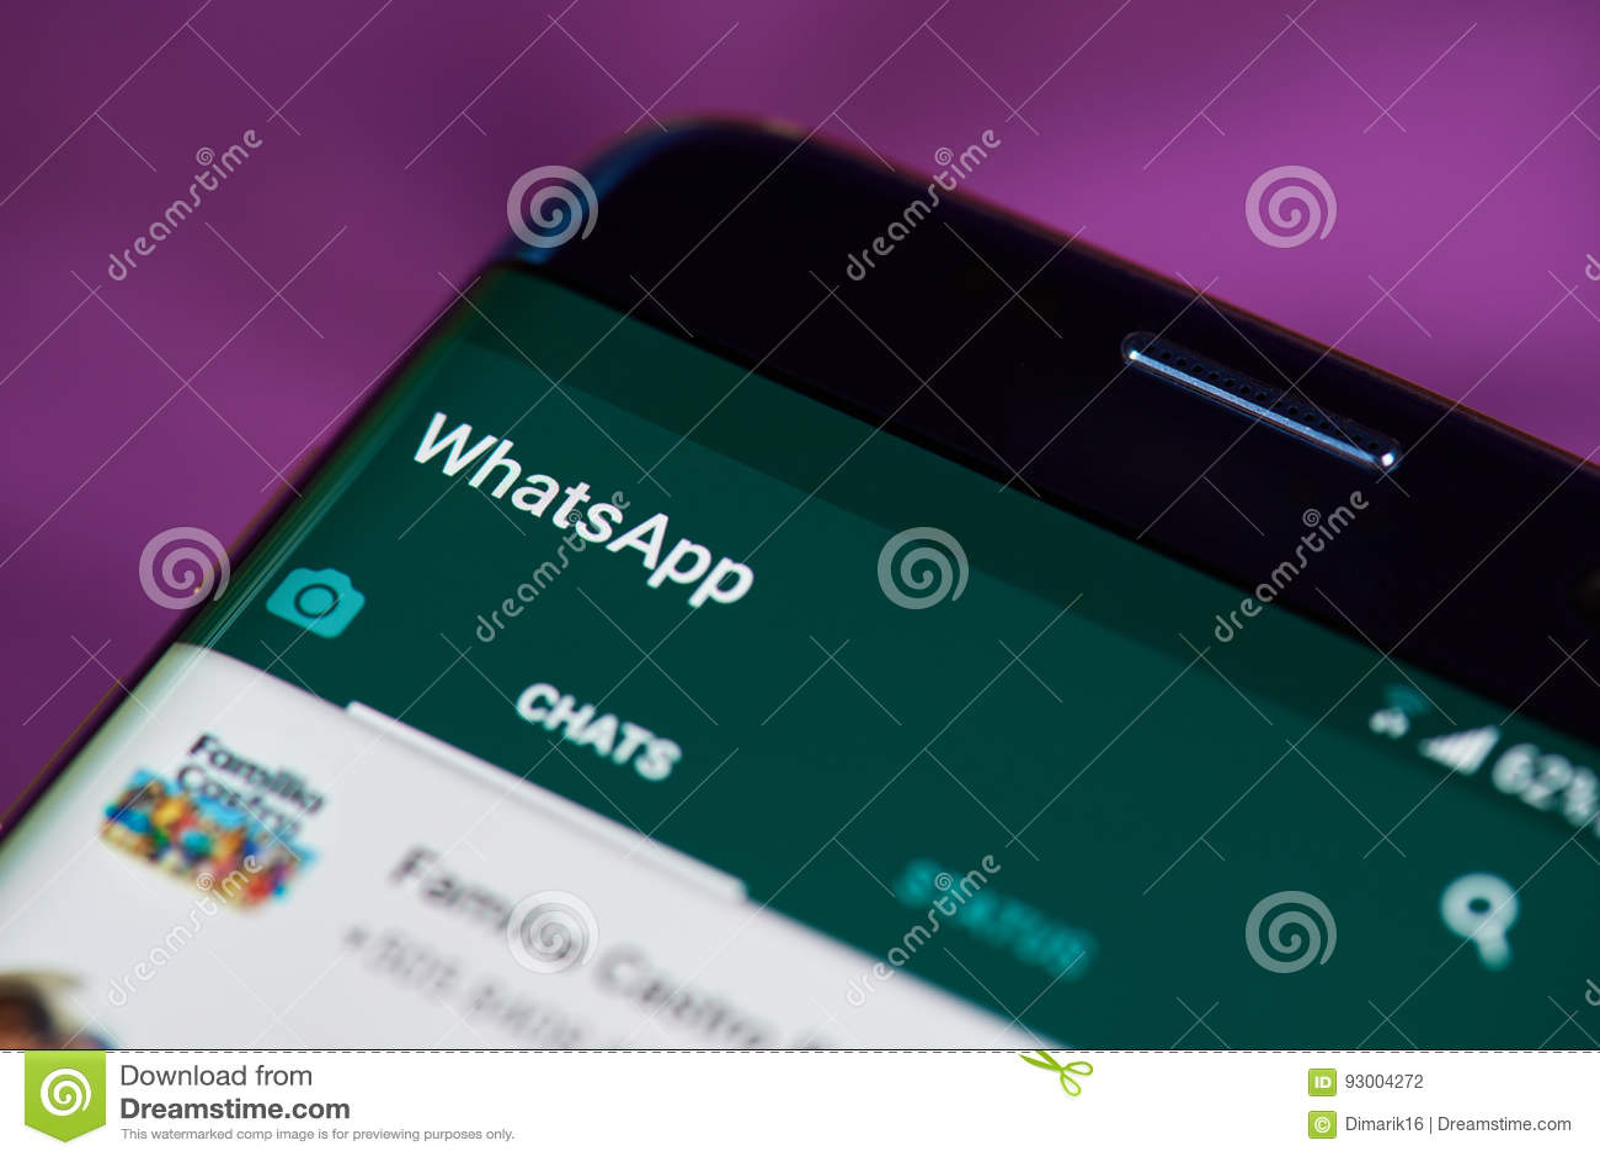 Whatsapp app on phone